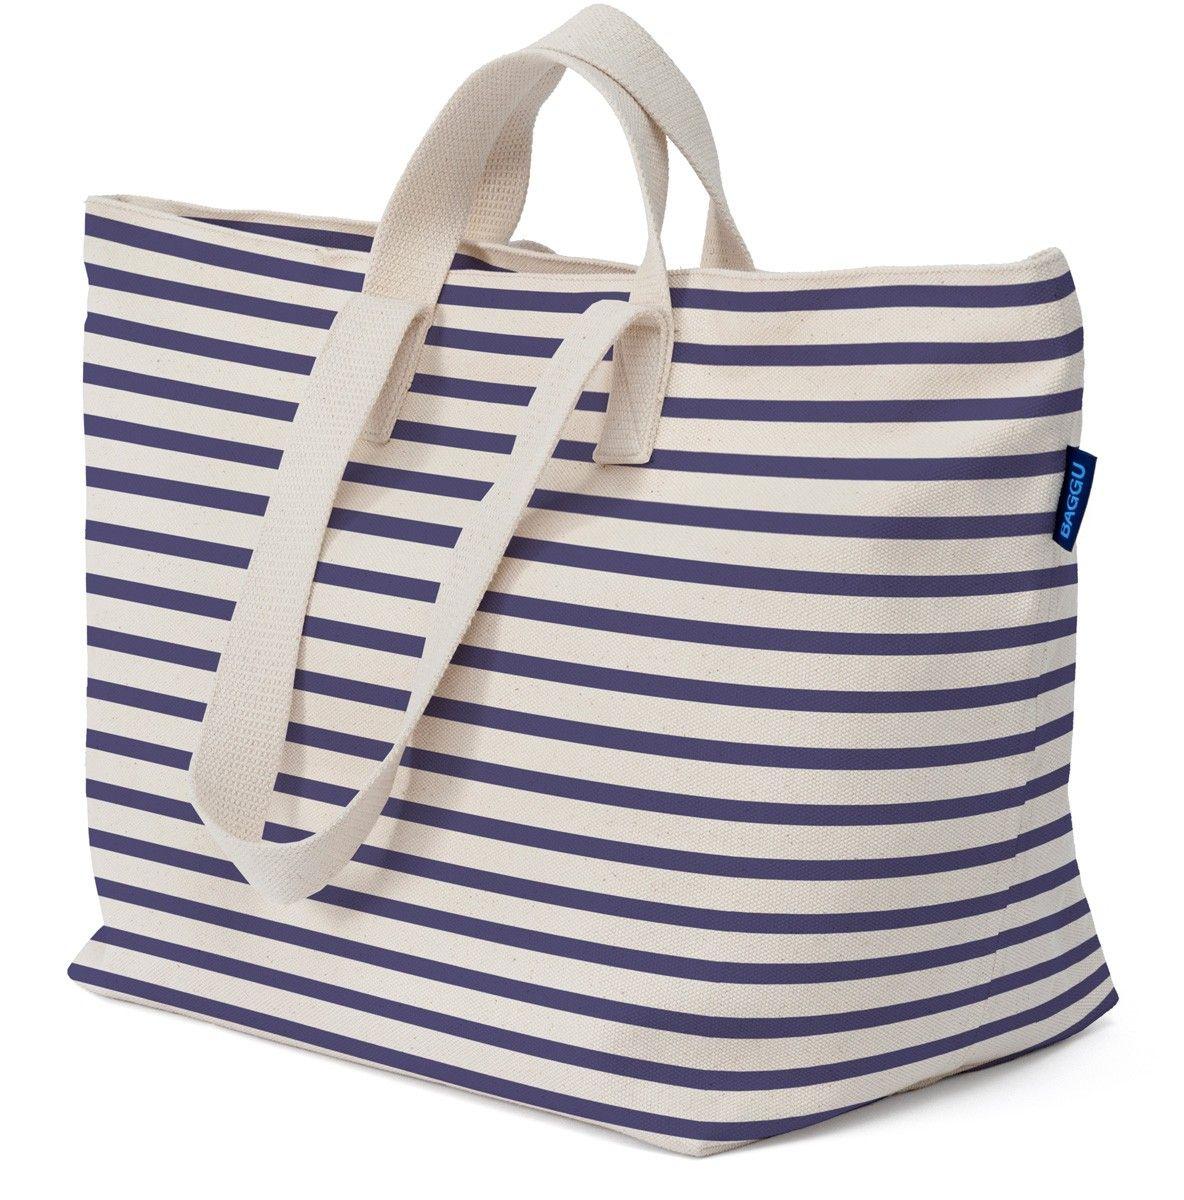 BAGGU WEEKEND BAG SAILOR STRIPE | Cute Travel Bags For Women ...